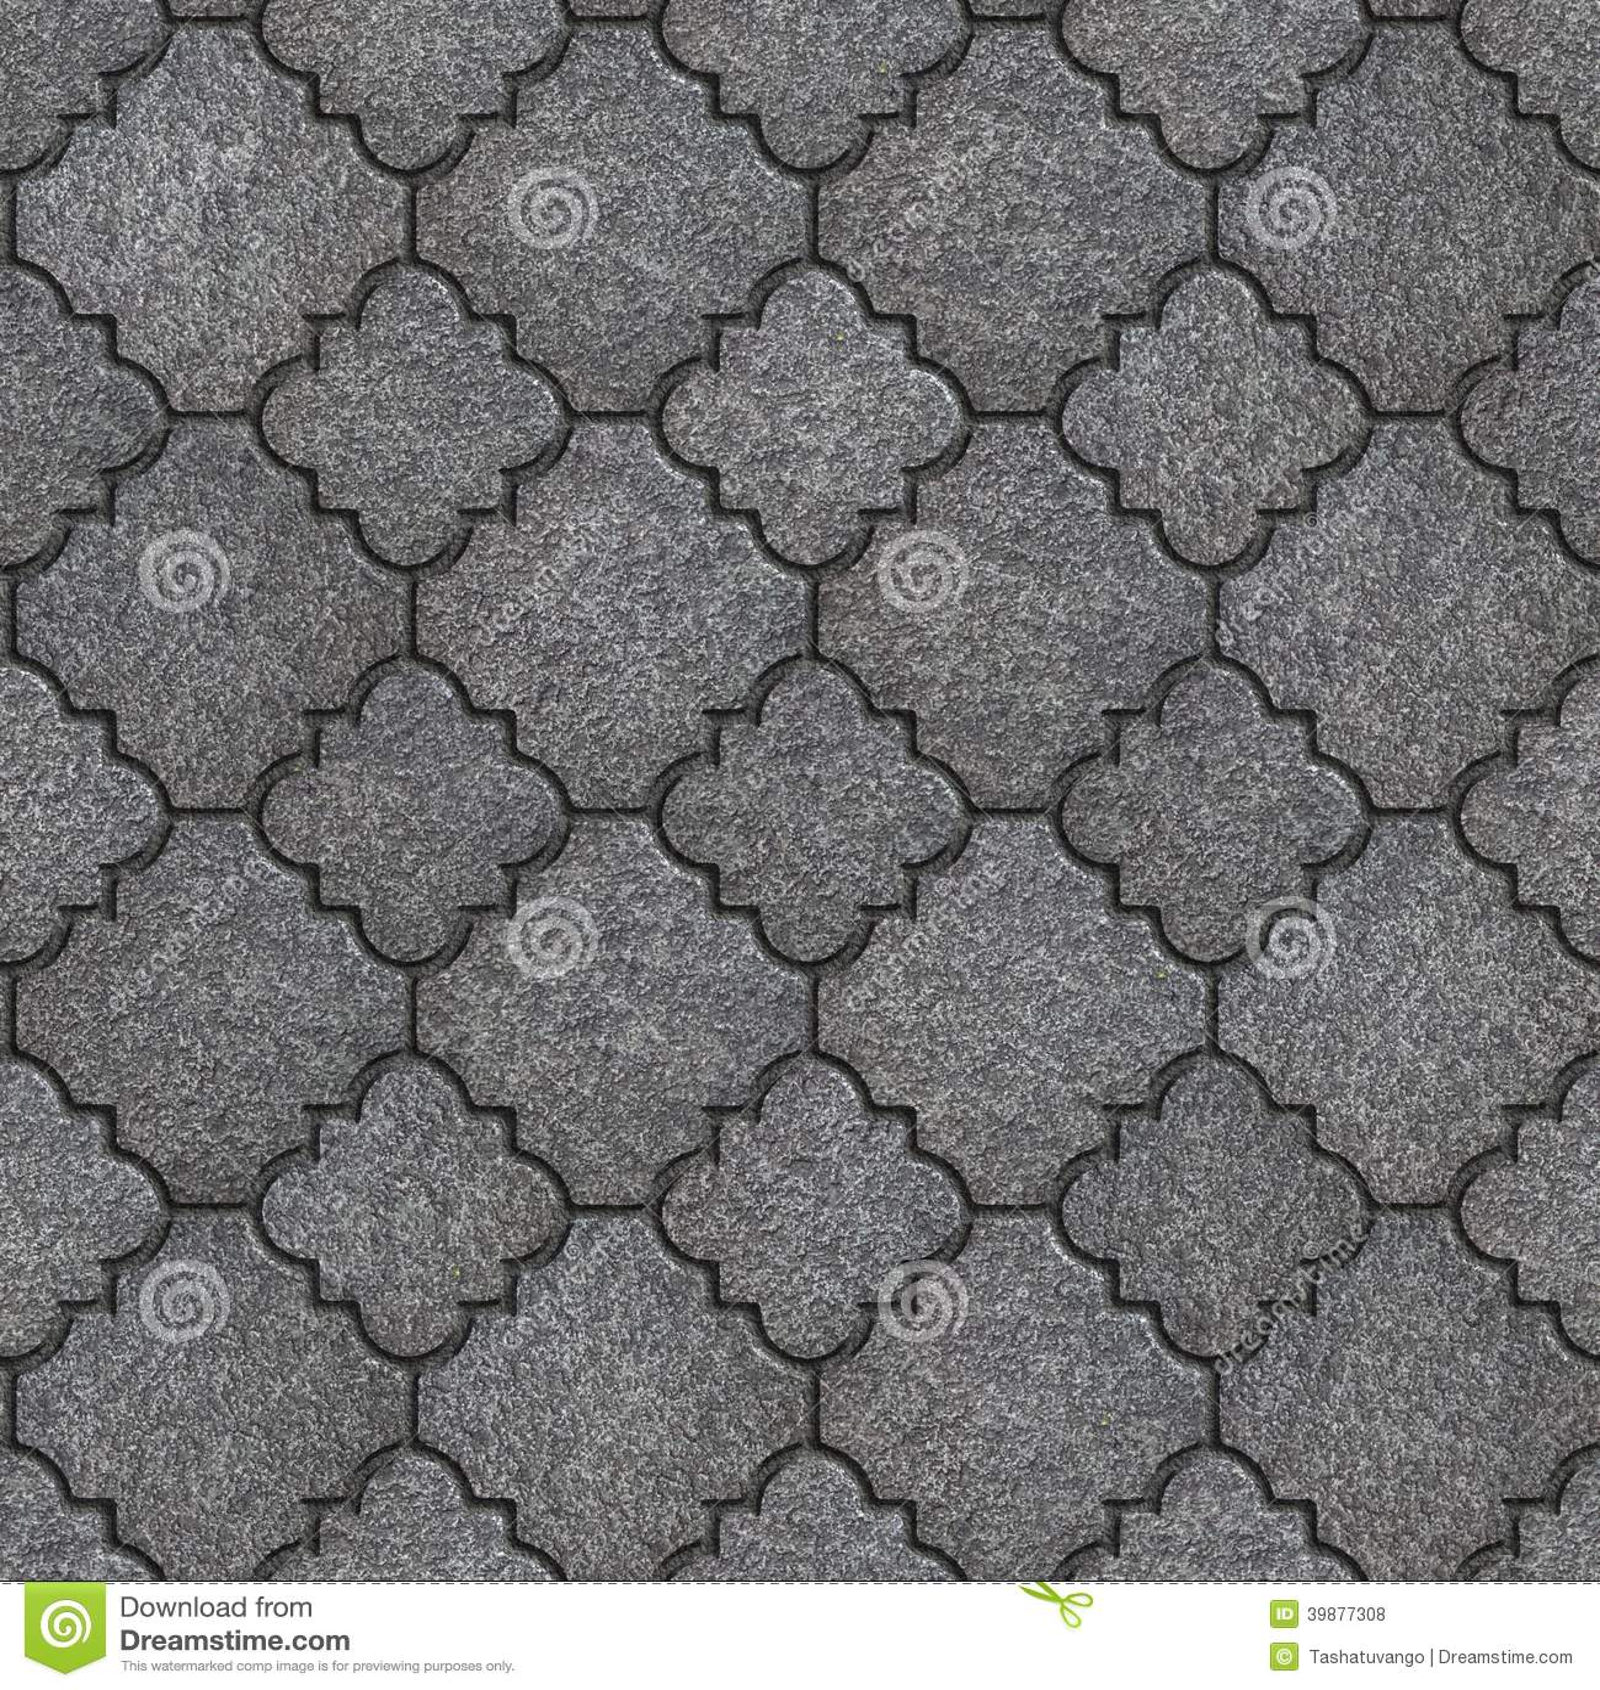 Texture Concrete Slab : Concrete paving slabs seamless tileable texture stock